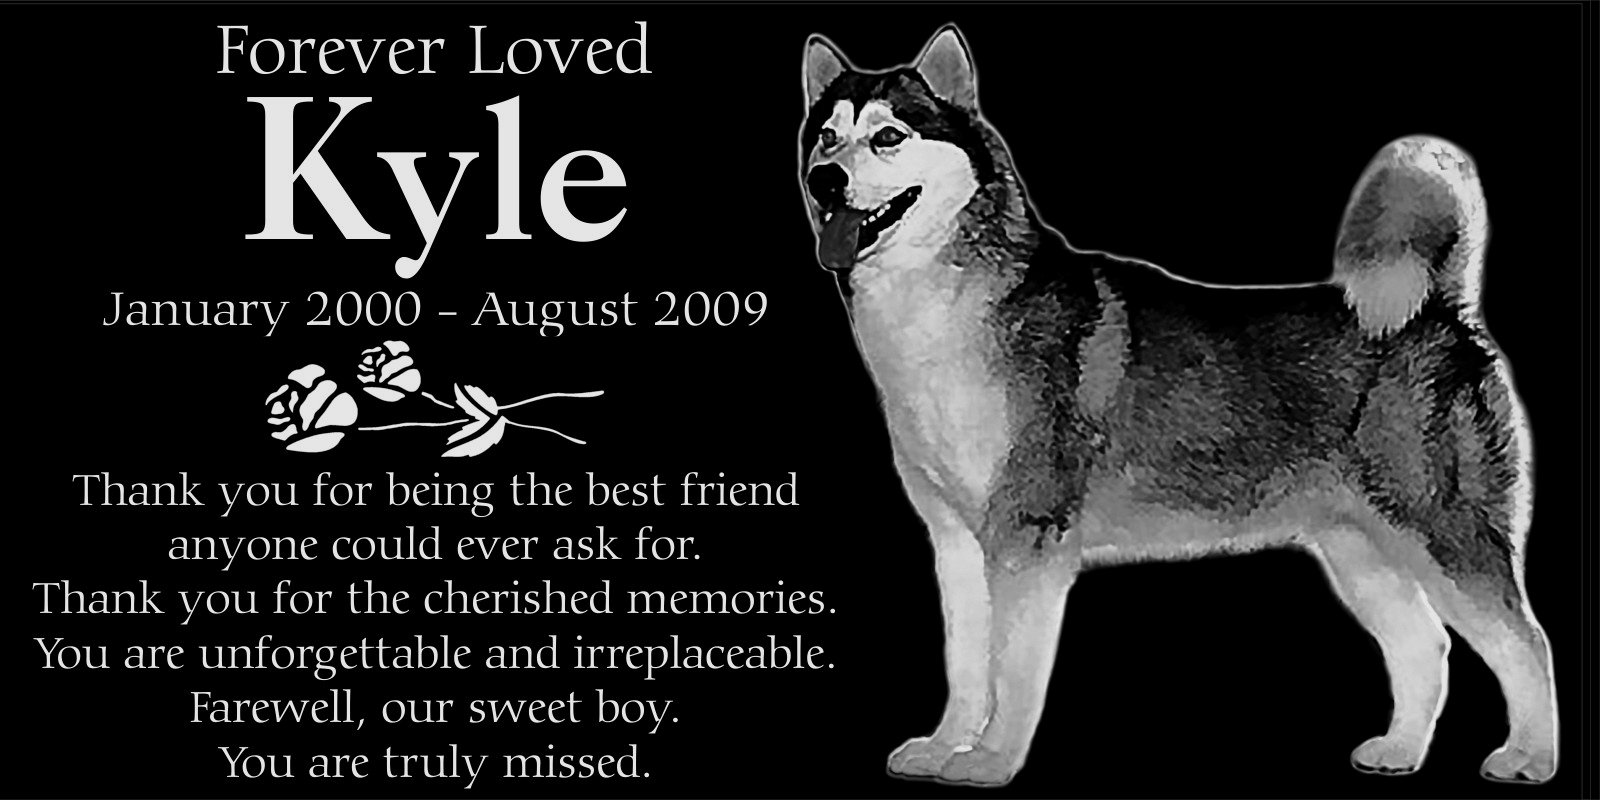 Personalized Alaskan Malamute Dog Pet Memorial 12''x6'' Engraved Black Granite Grave Marker Head Stone Plaque KYL1